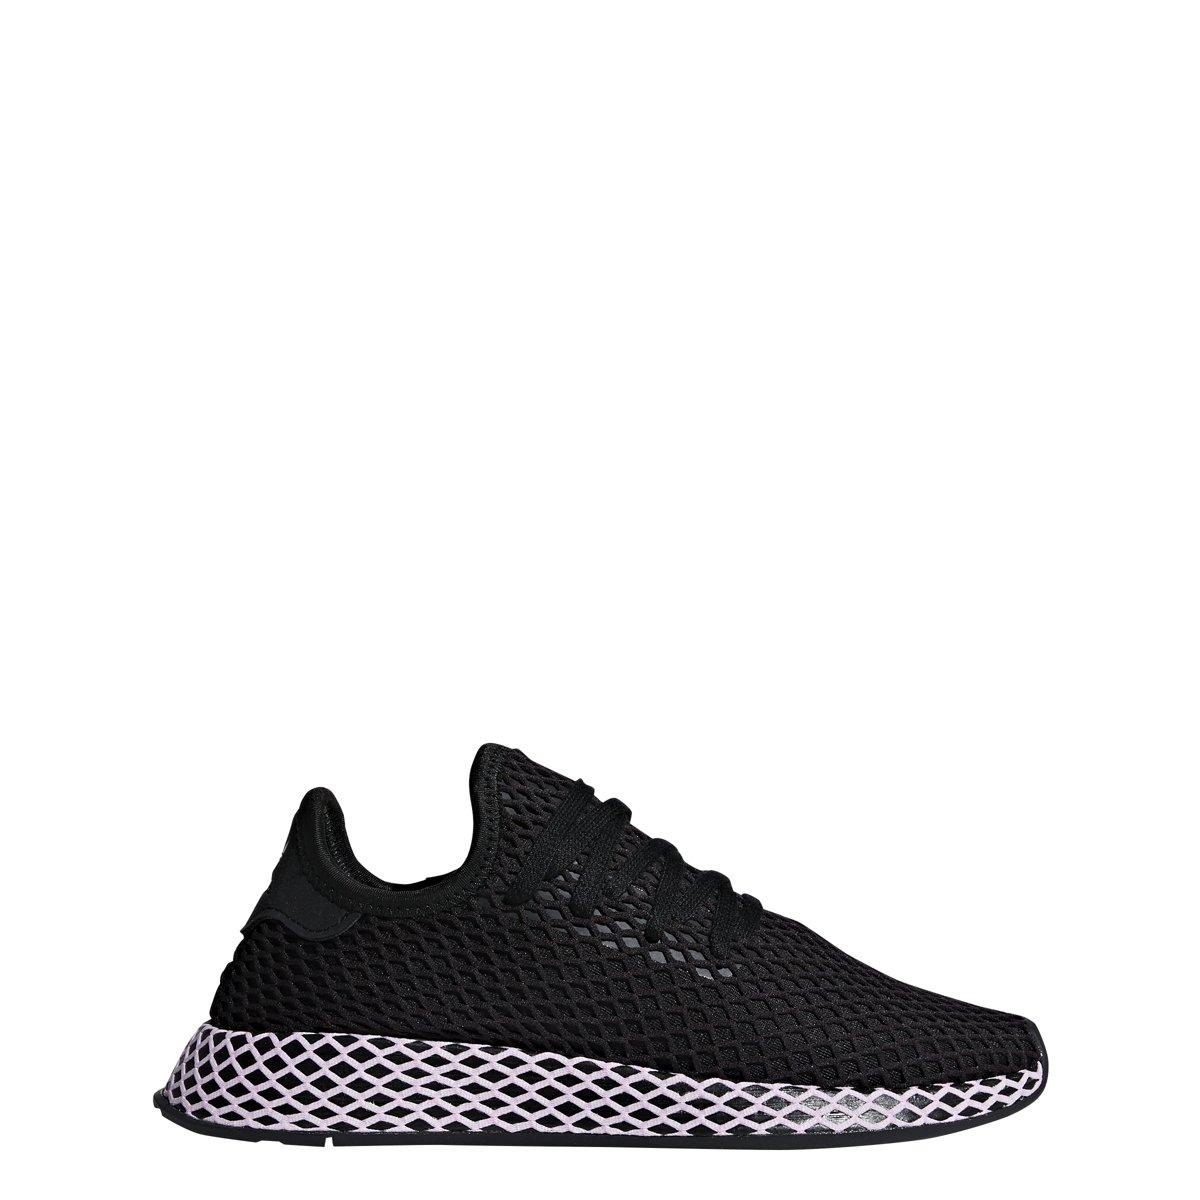 adidas Womens DEERUPT W Black/Black/Lilac - B37602 (8)